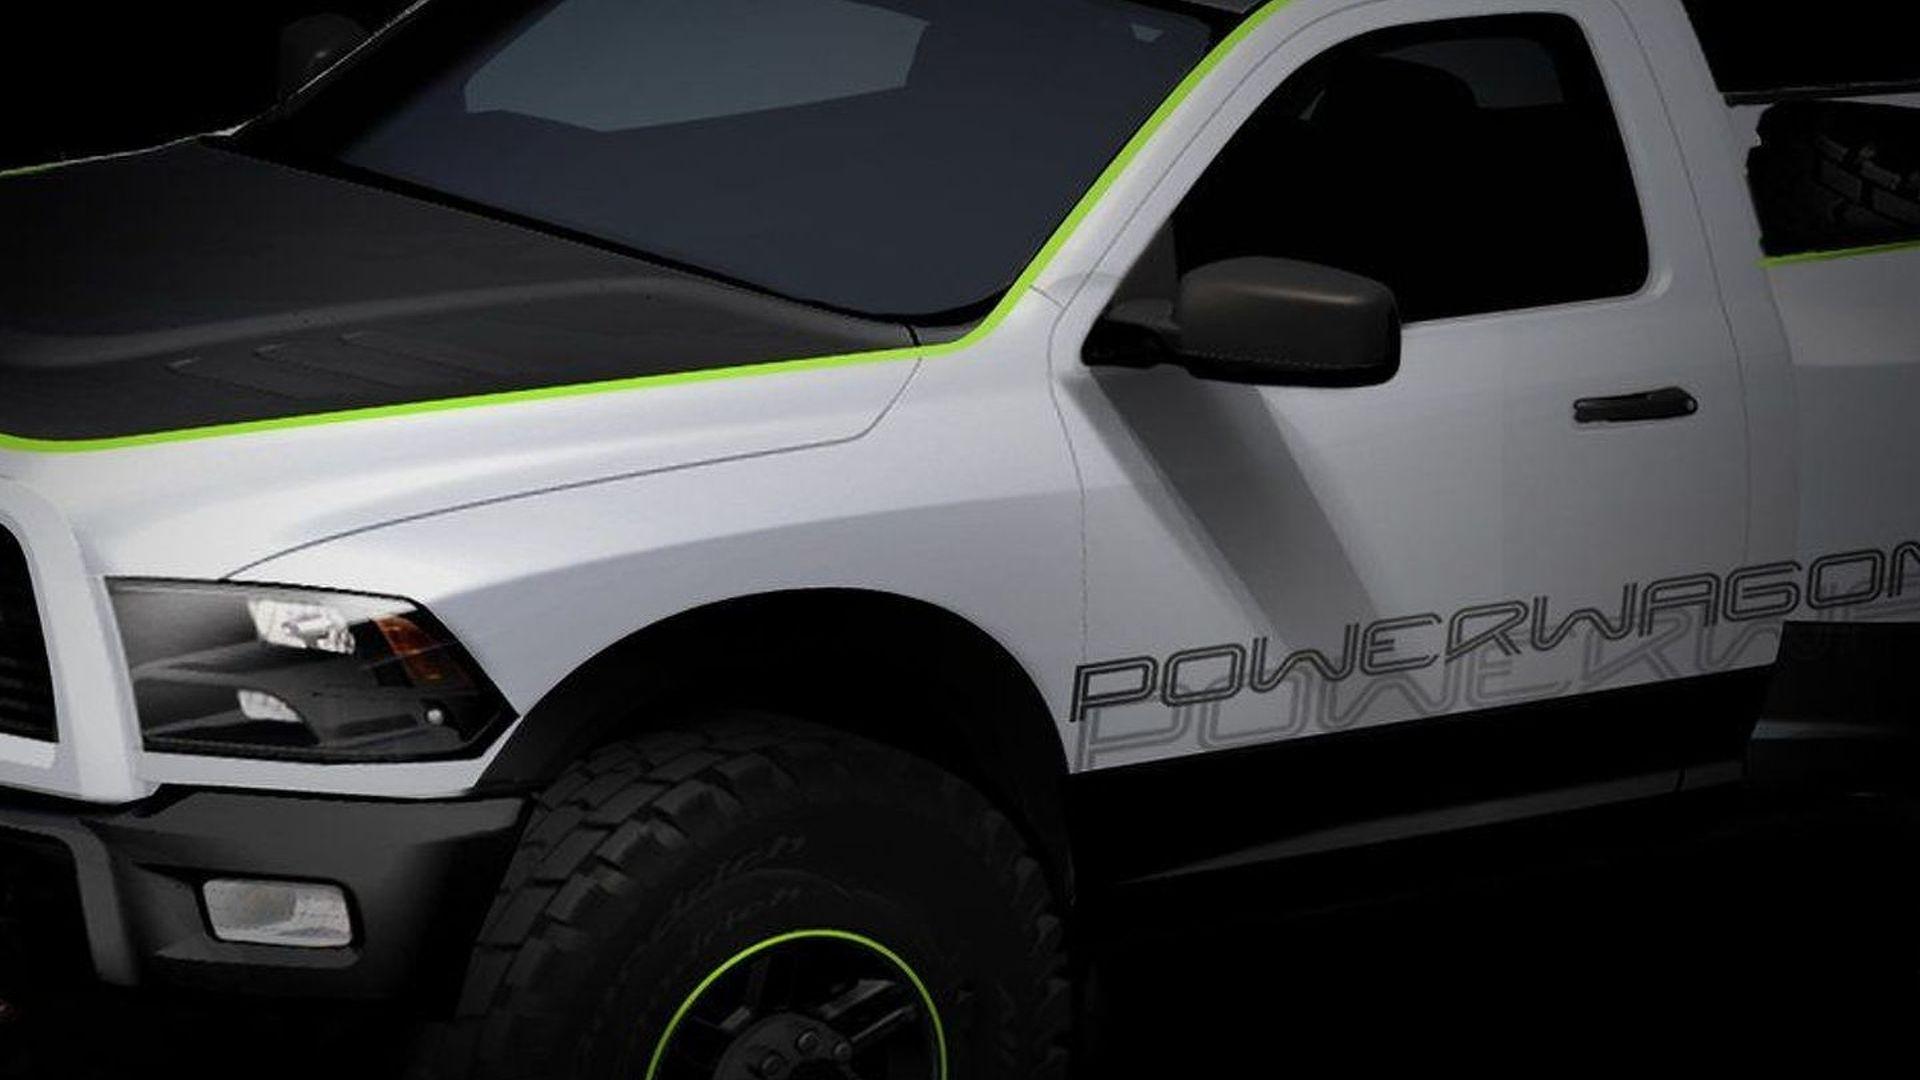 Chrysler *Moparized* Truck Sketches Released